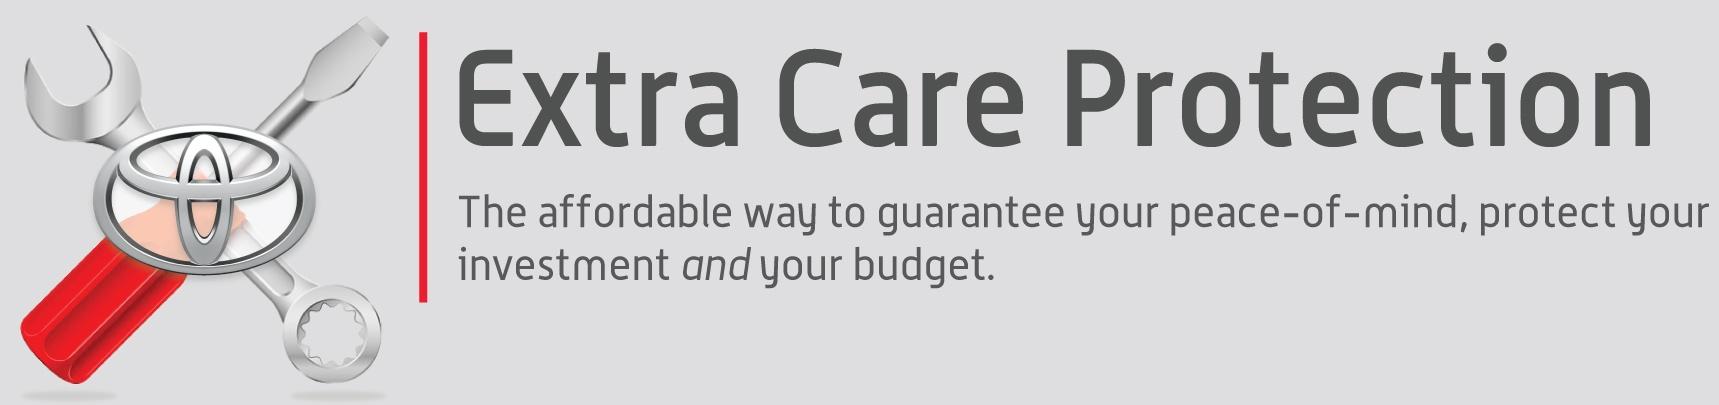 Extra Care Protection Service at Burlington Toyota